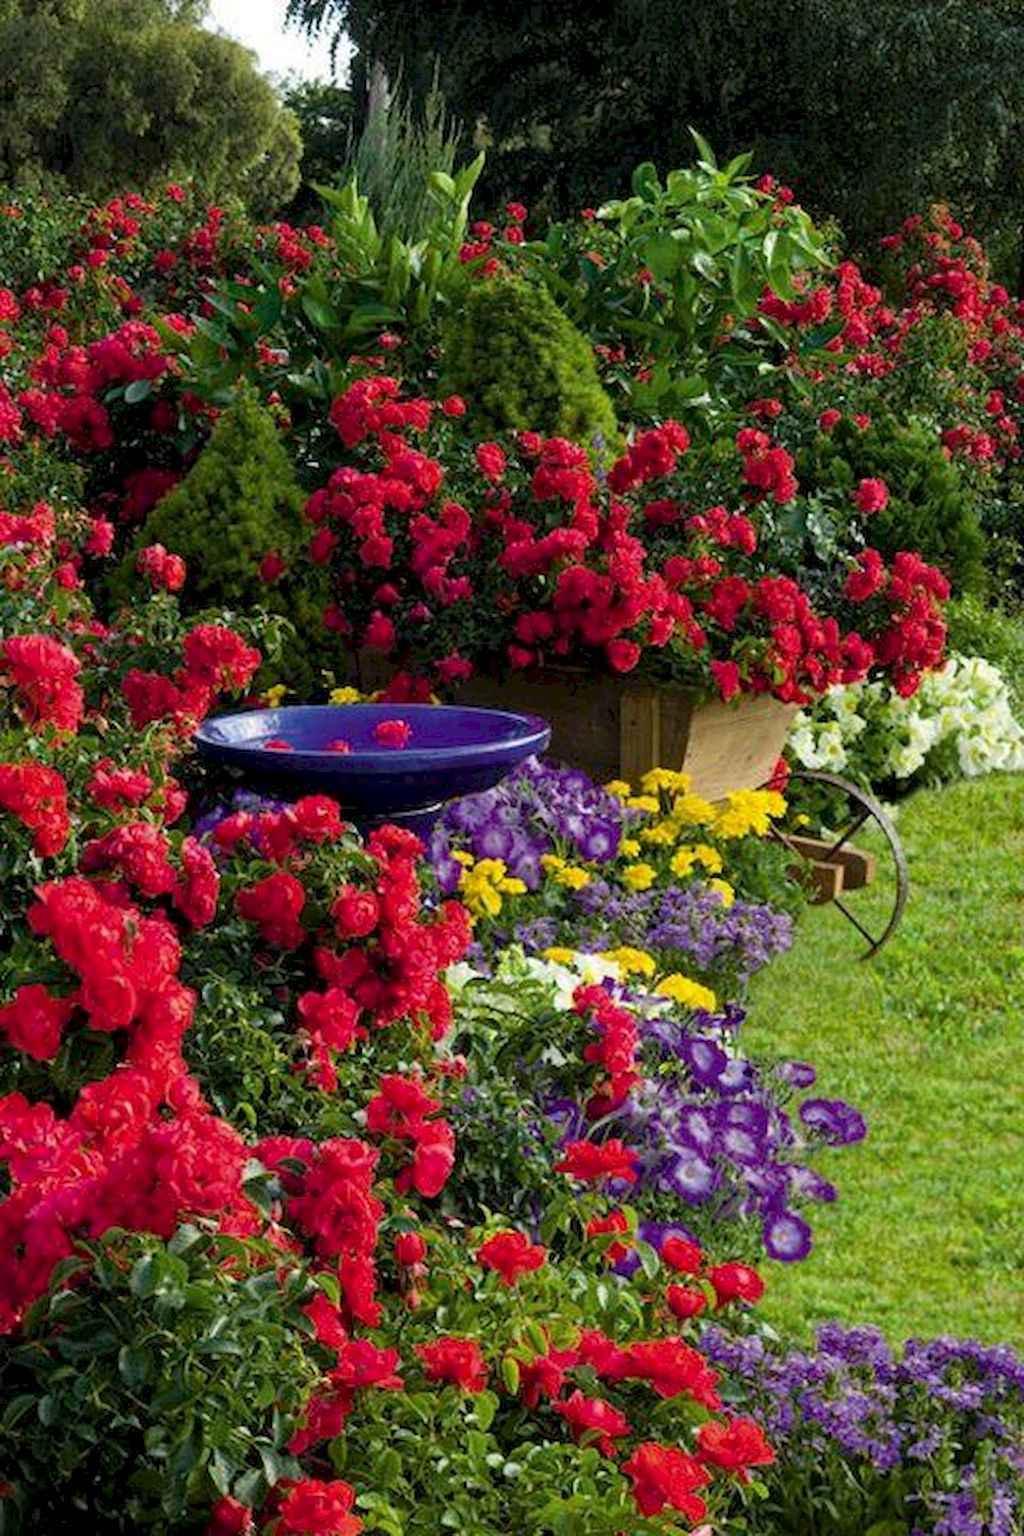 50 cheap and easy flower garden ideas (7)